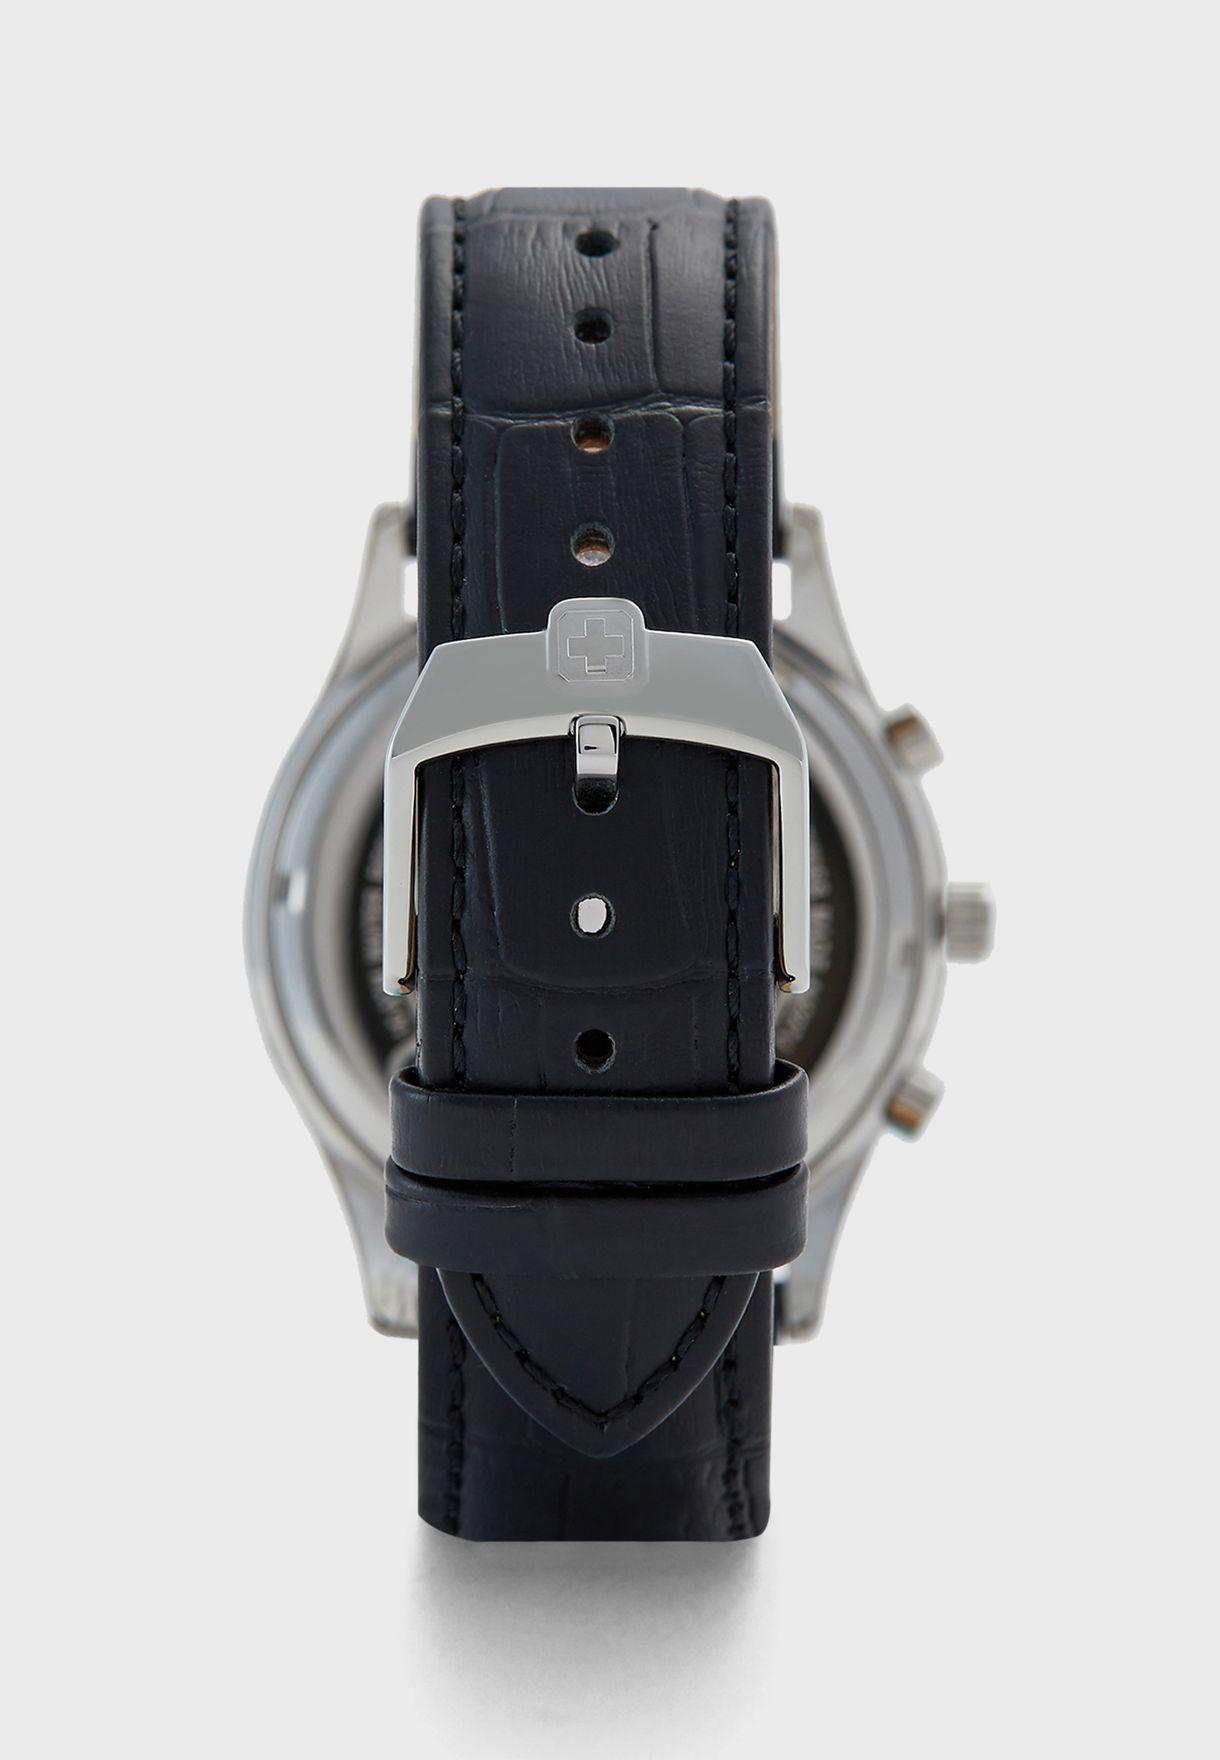 W S6-4187.04.001 Patriot Chronograph Watch